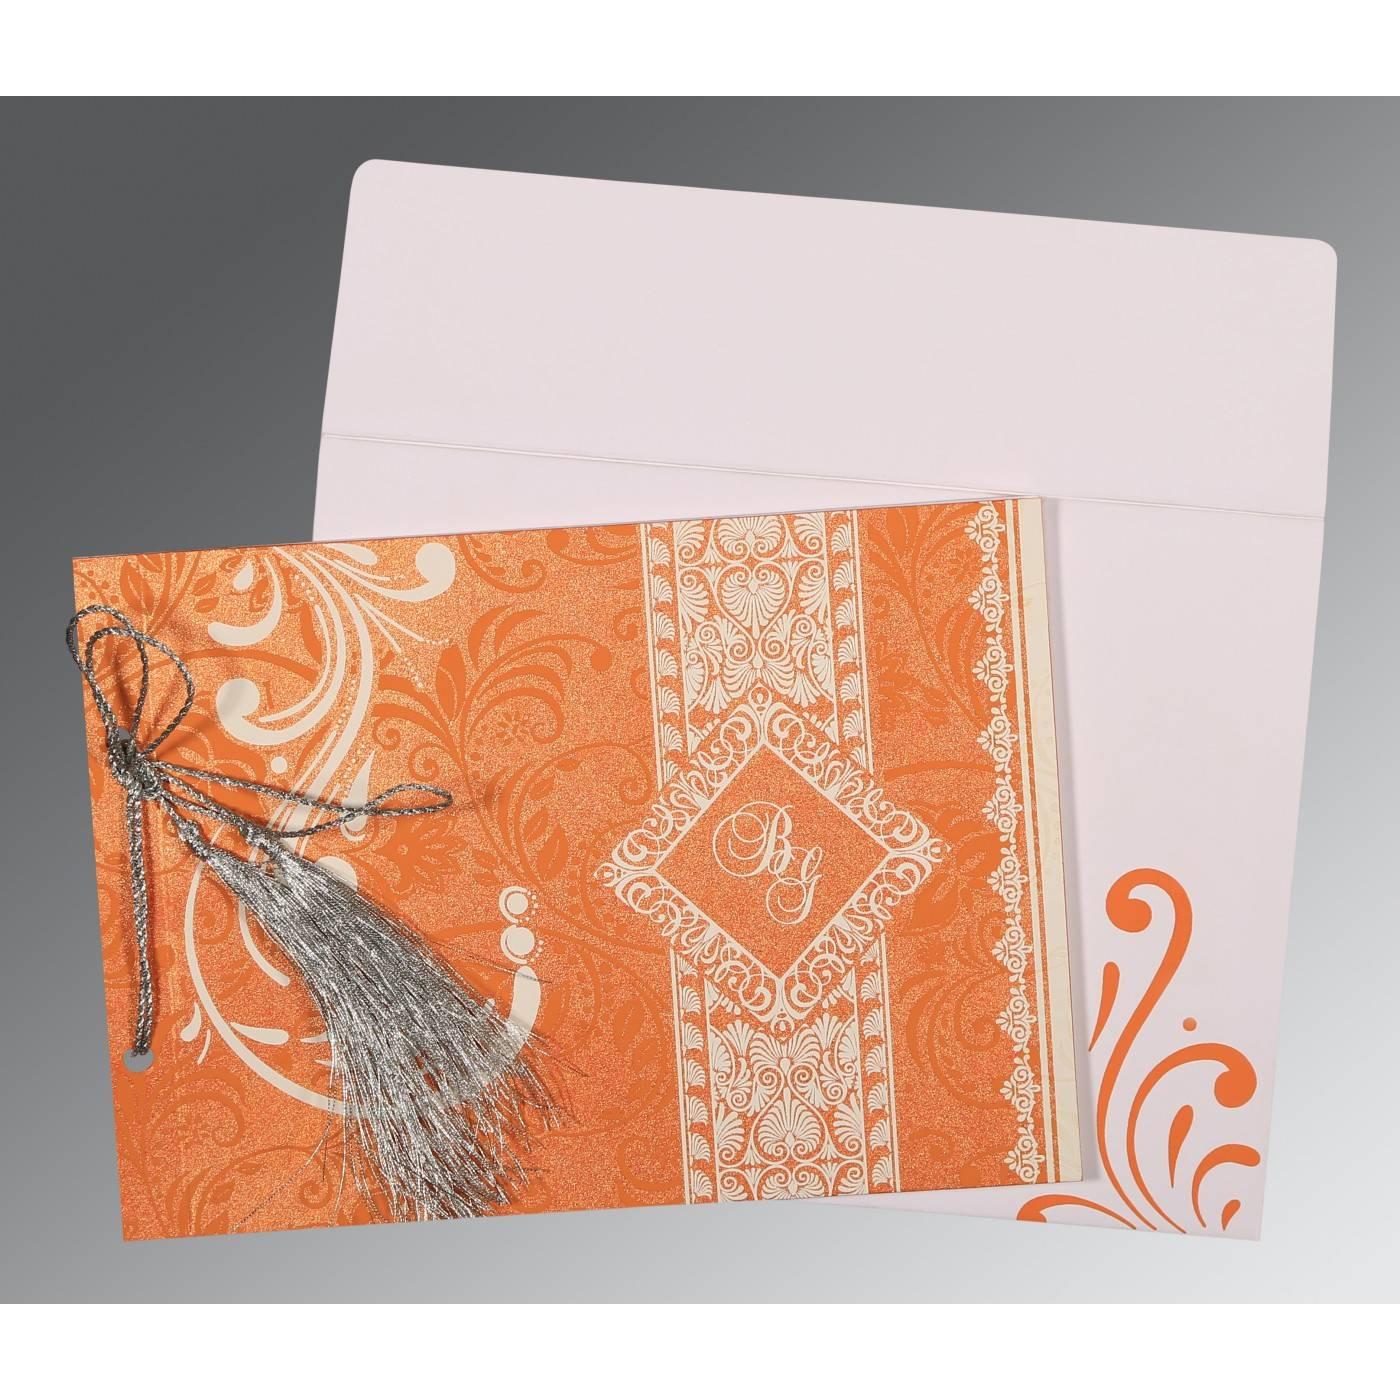 SALMON SHIMMERY SCREEN PRINTED WEDDING CARD : CS-8223K - IndianWeddingCards